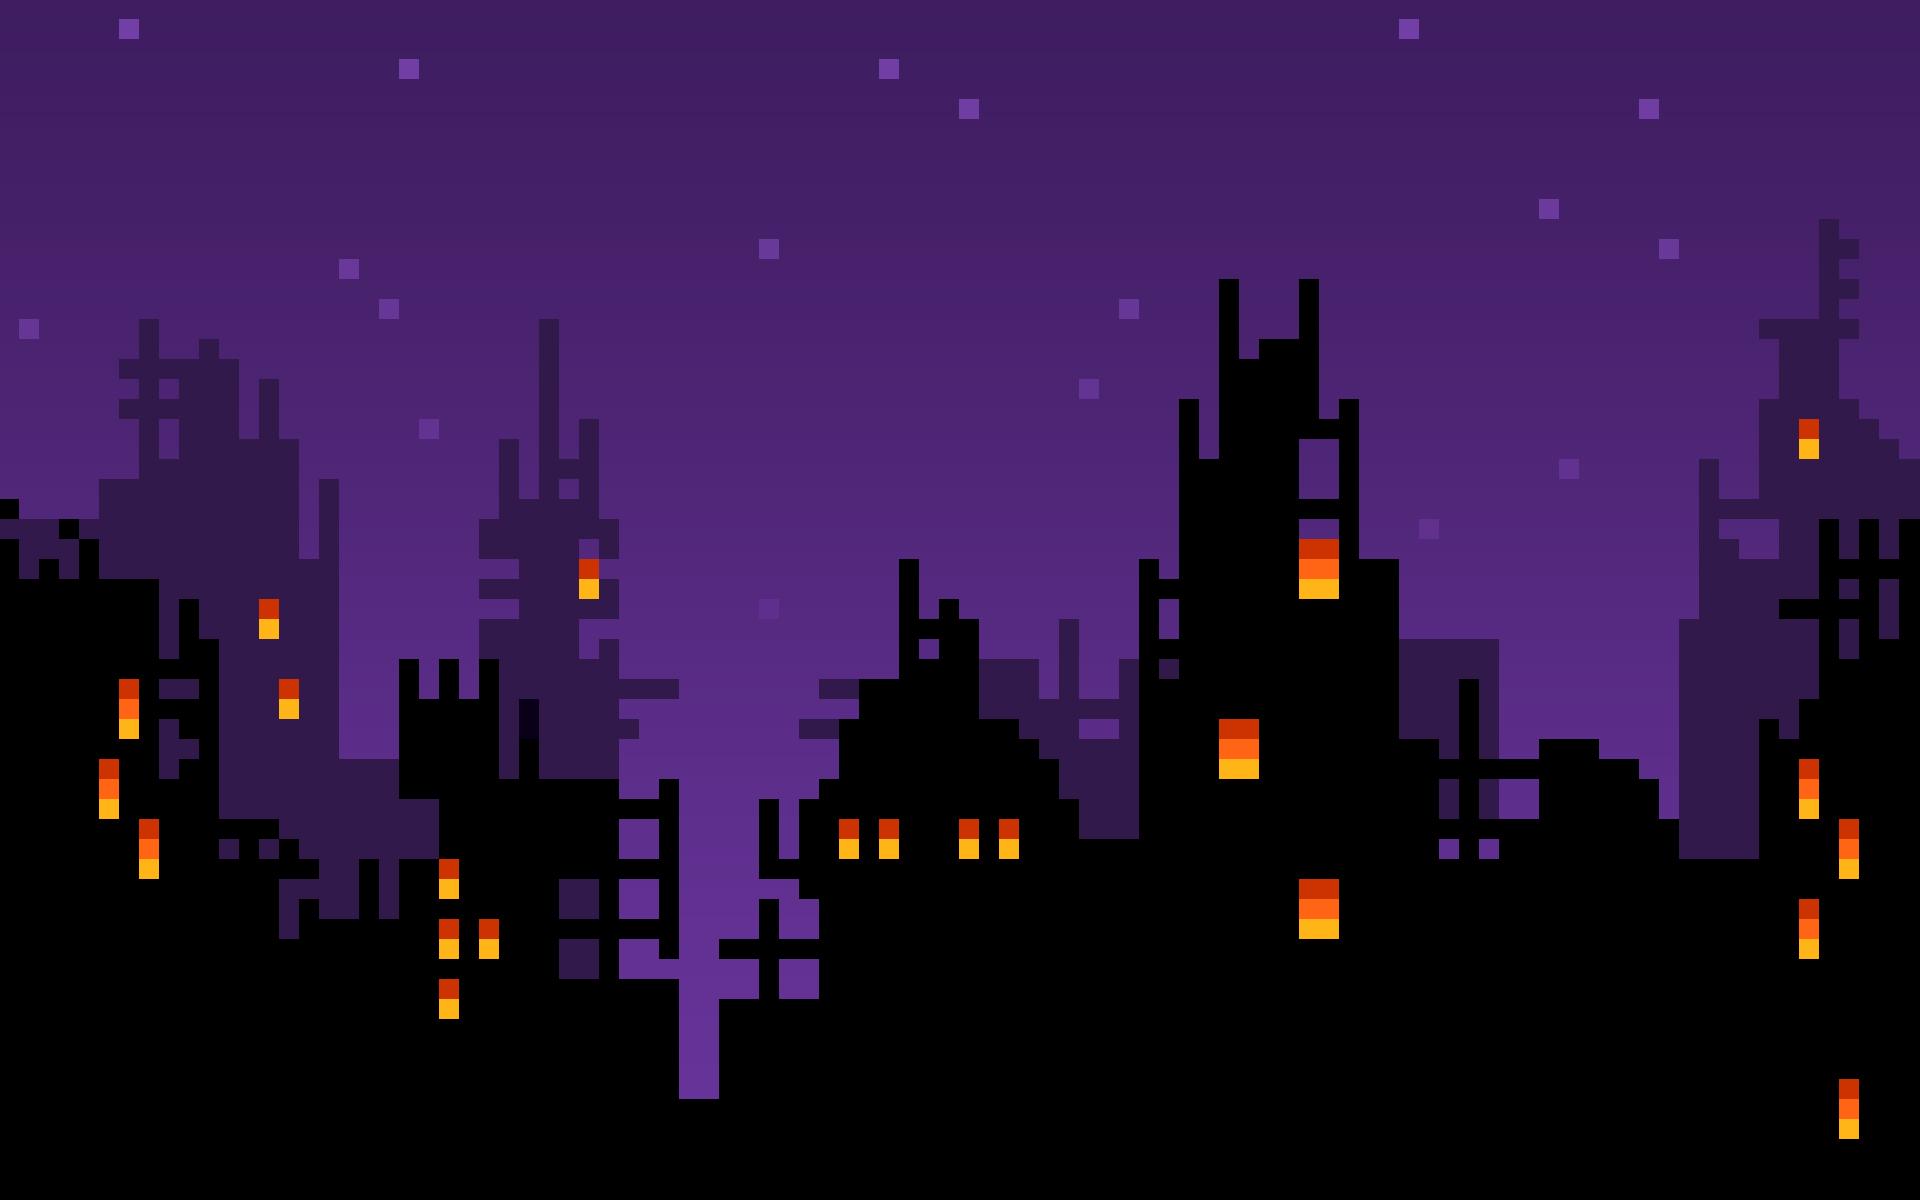 8-bit world at night